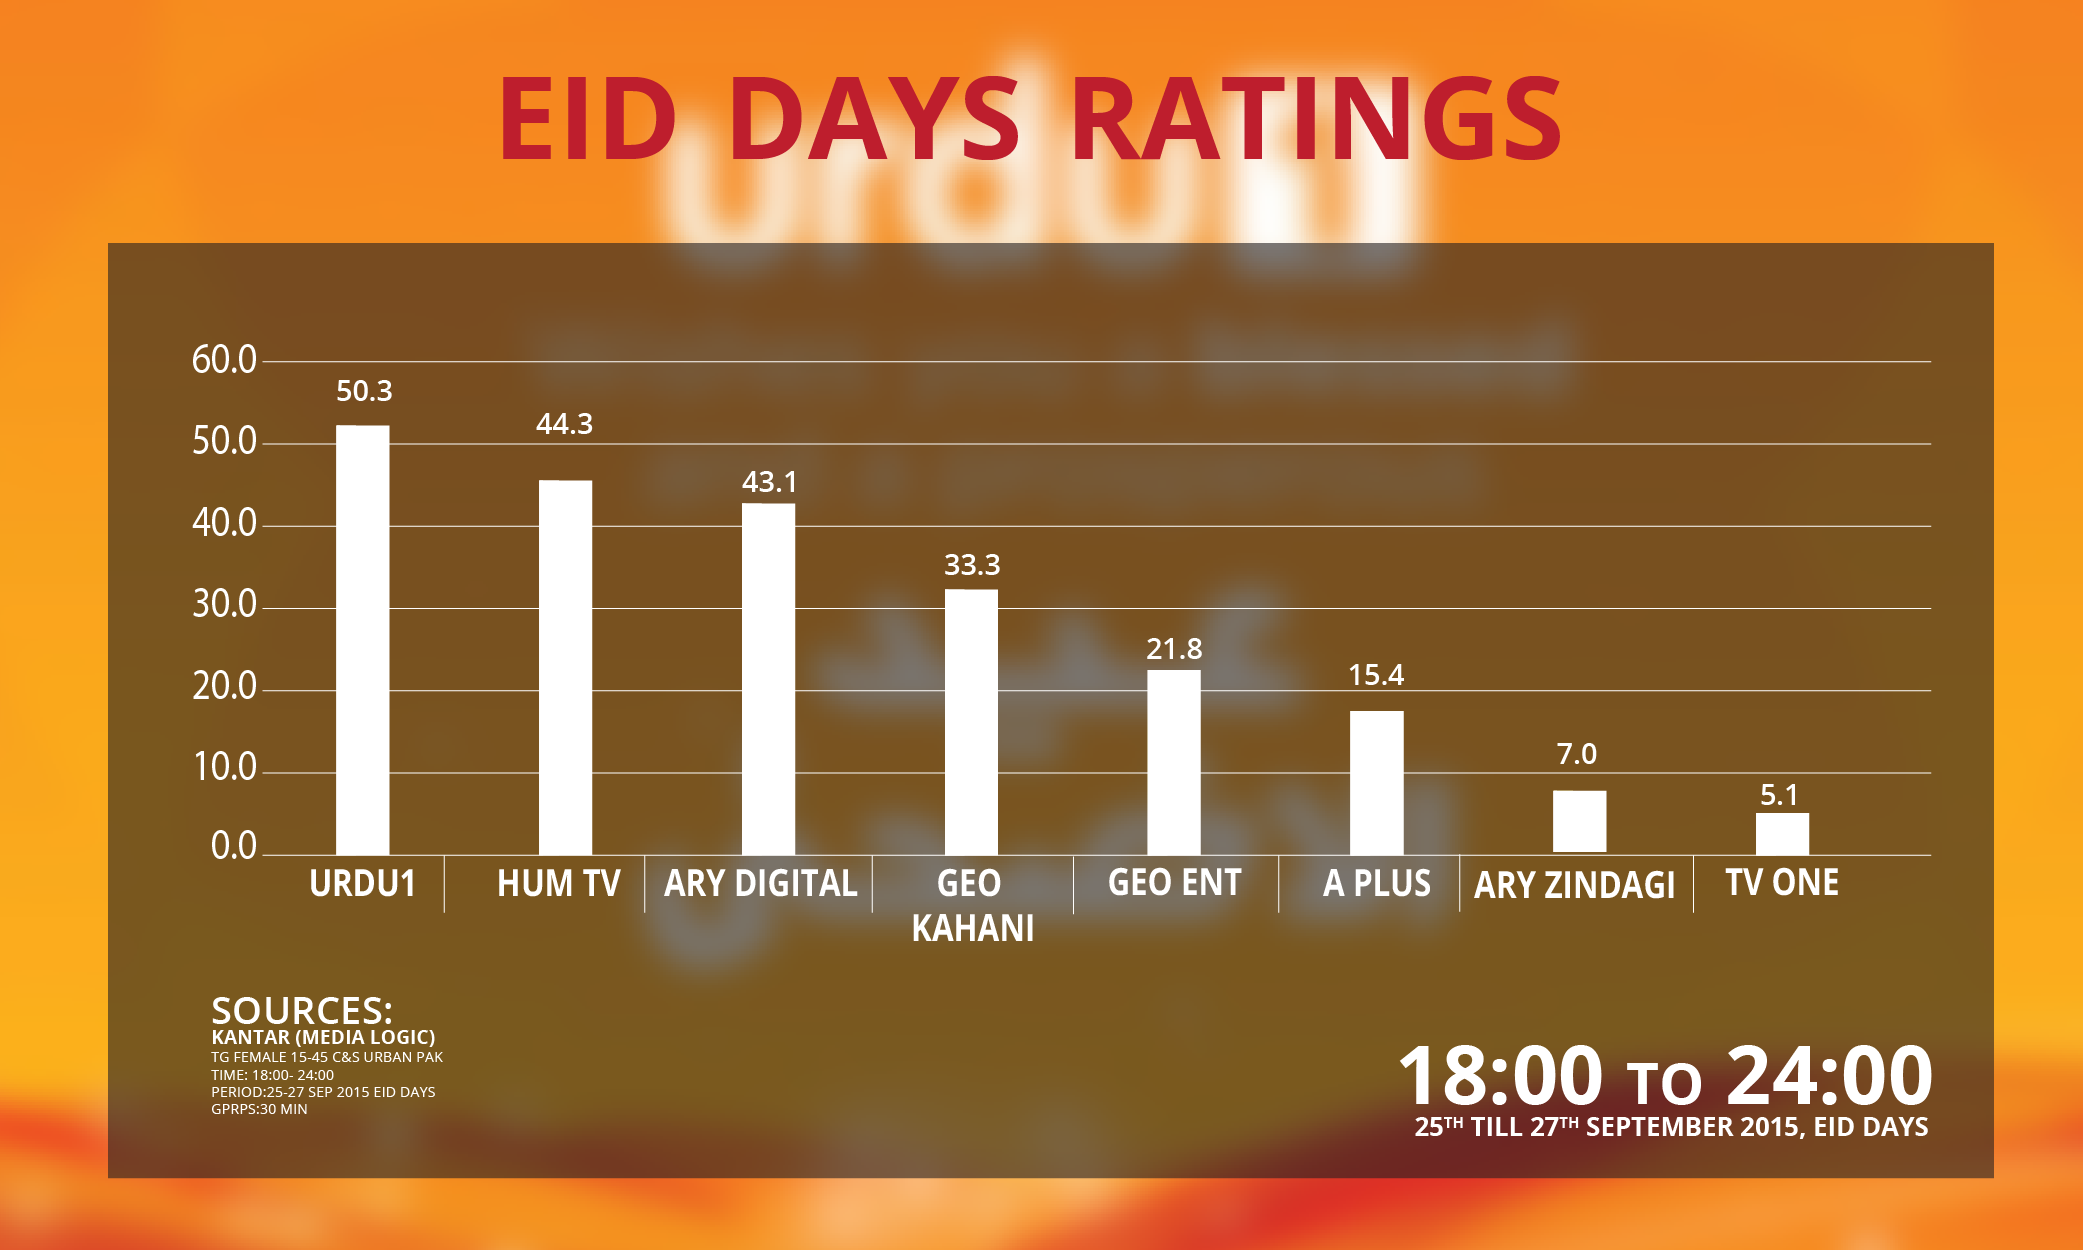 Eid days rating-01-01